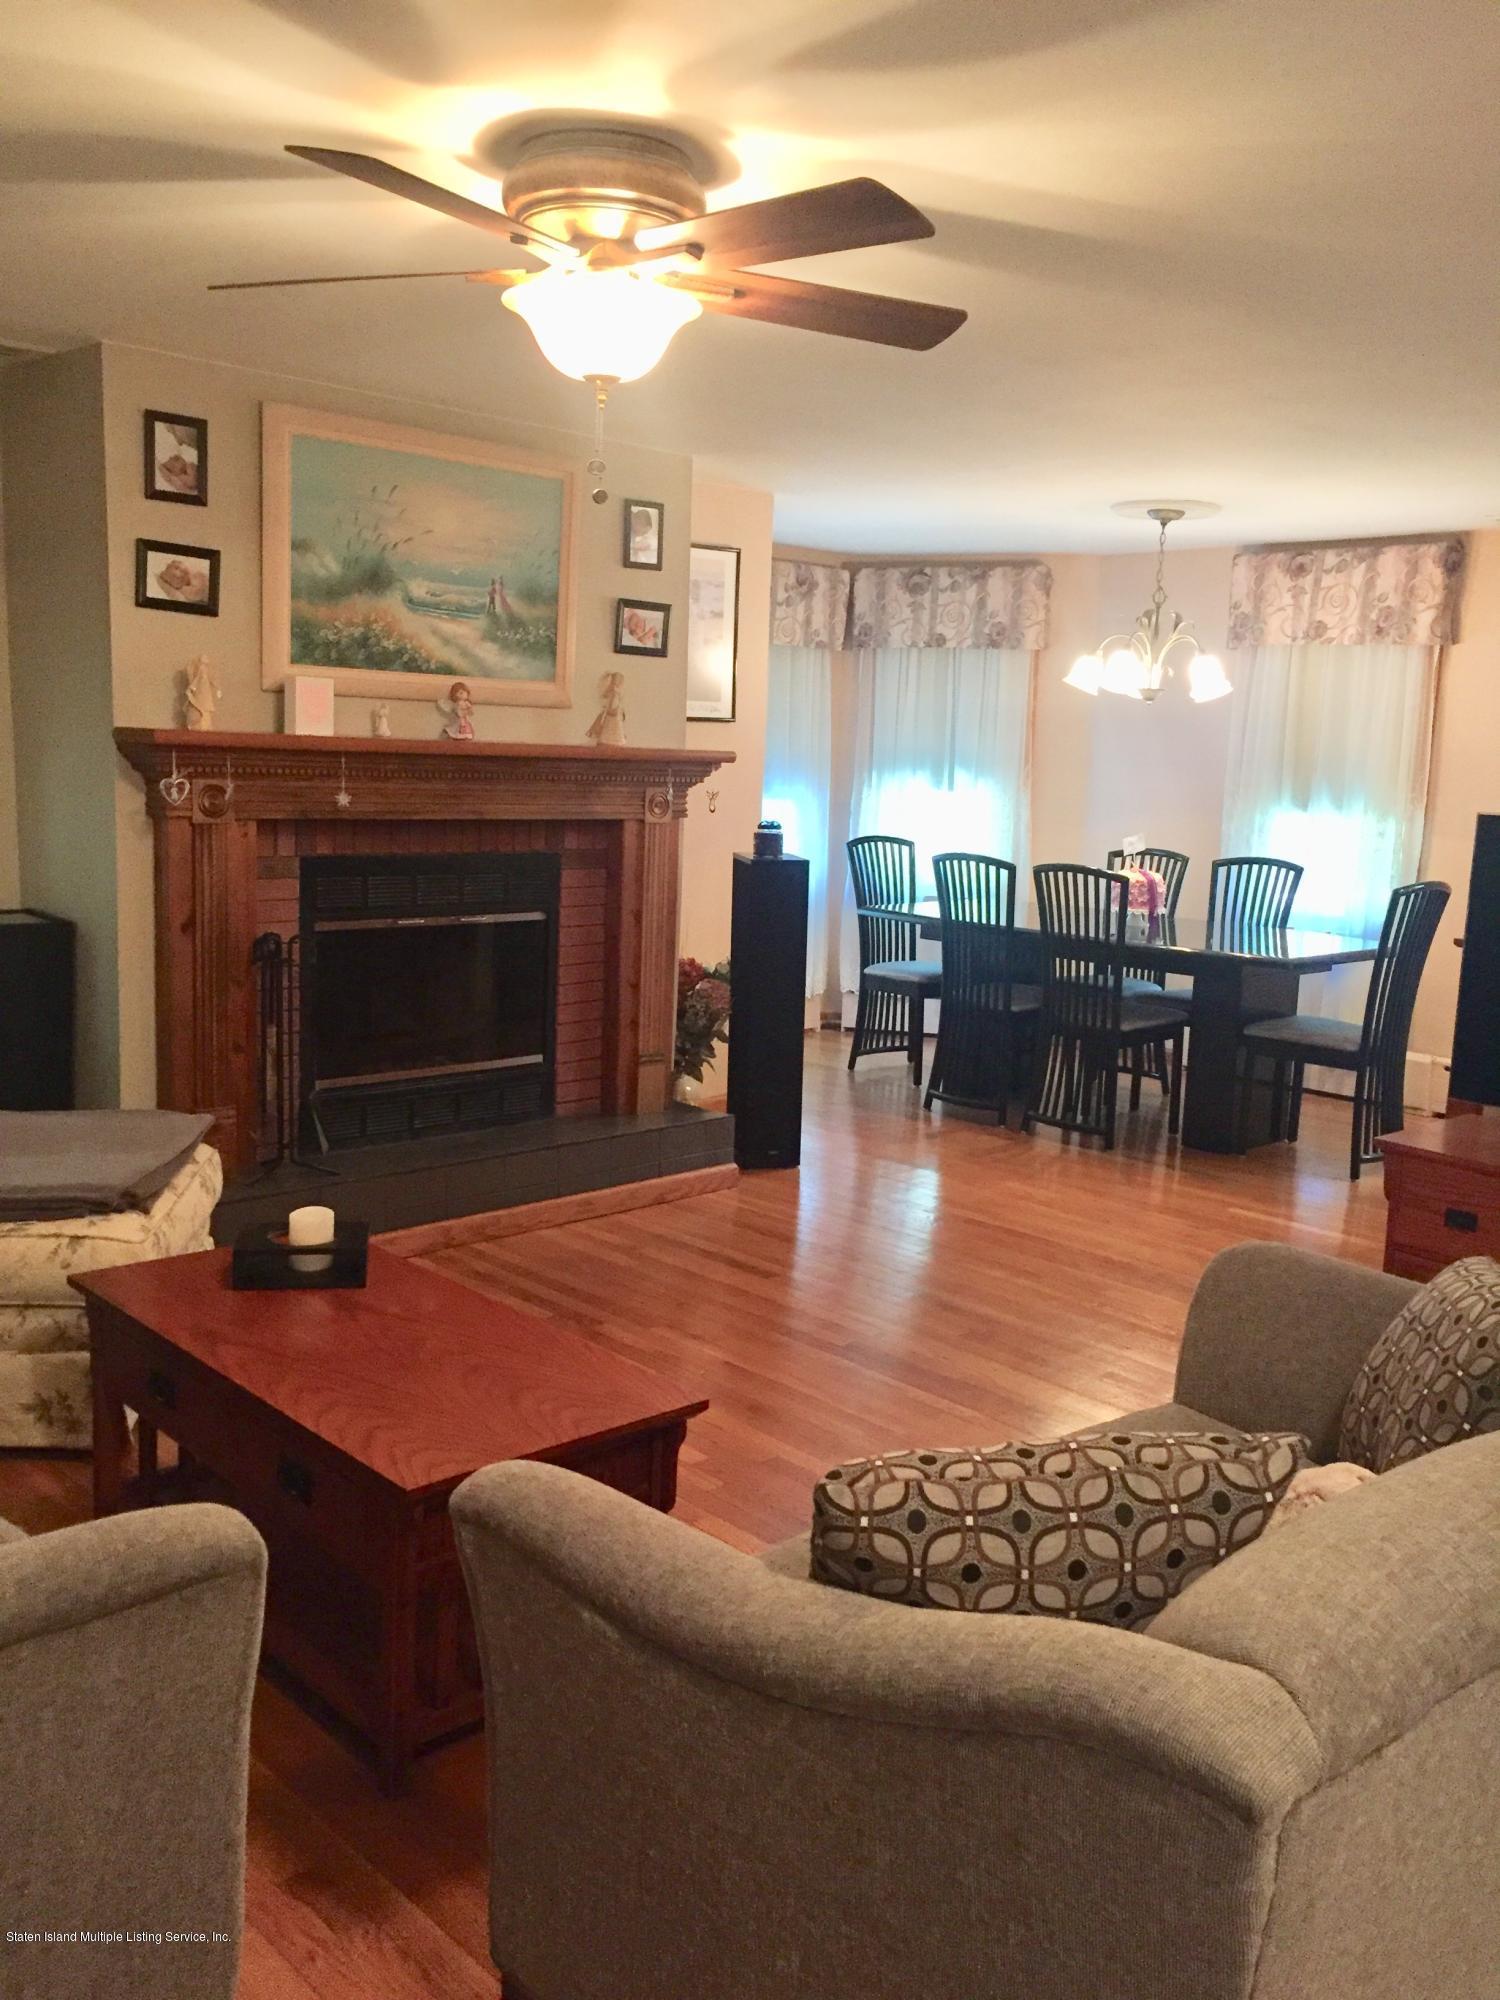 Single Family - Detached 113 Woodvale Avenue  Staten Island, NY 10309, MLS-1127531-4